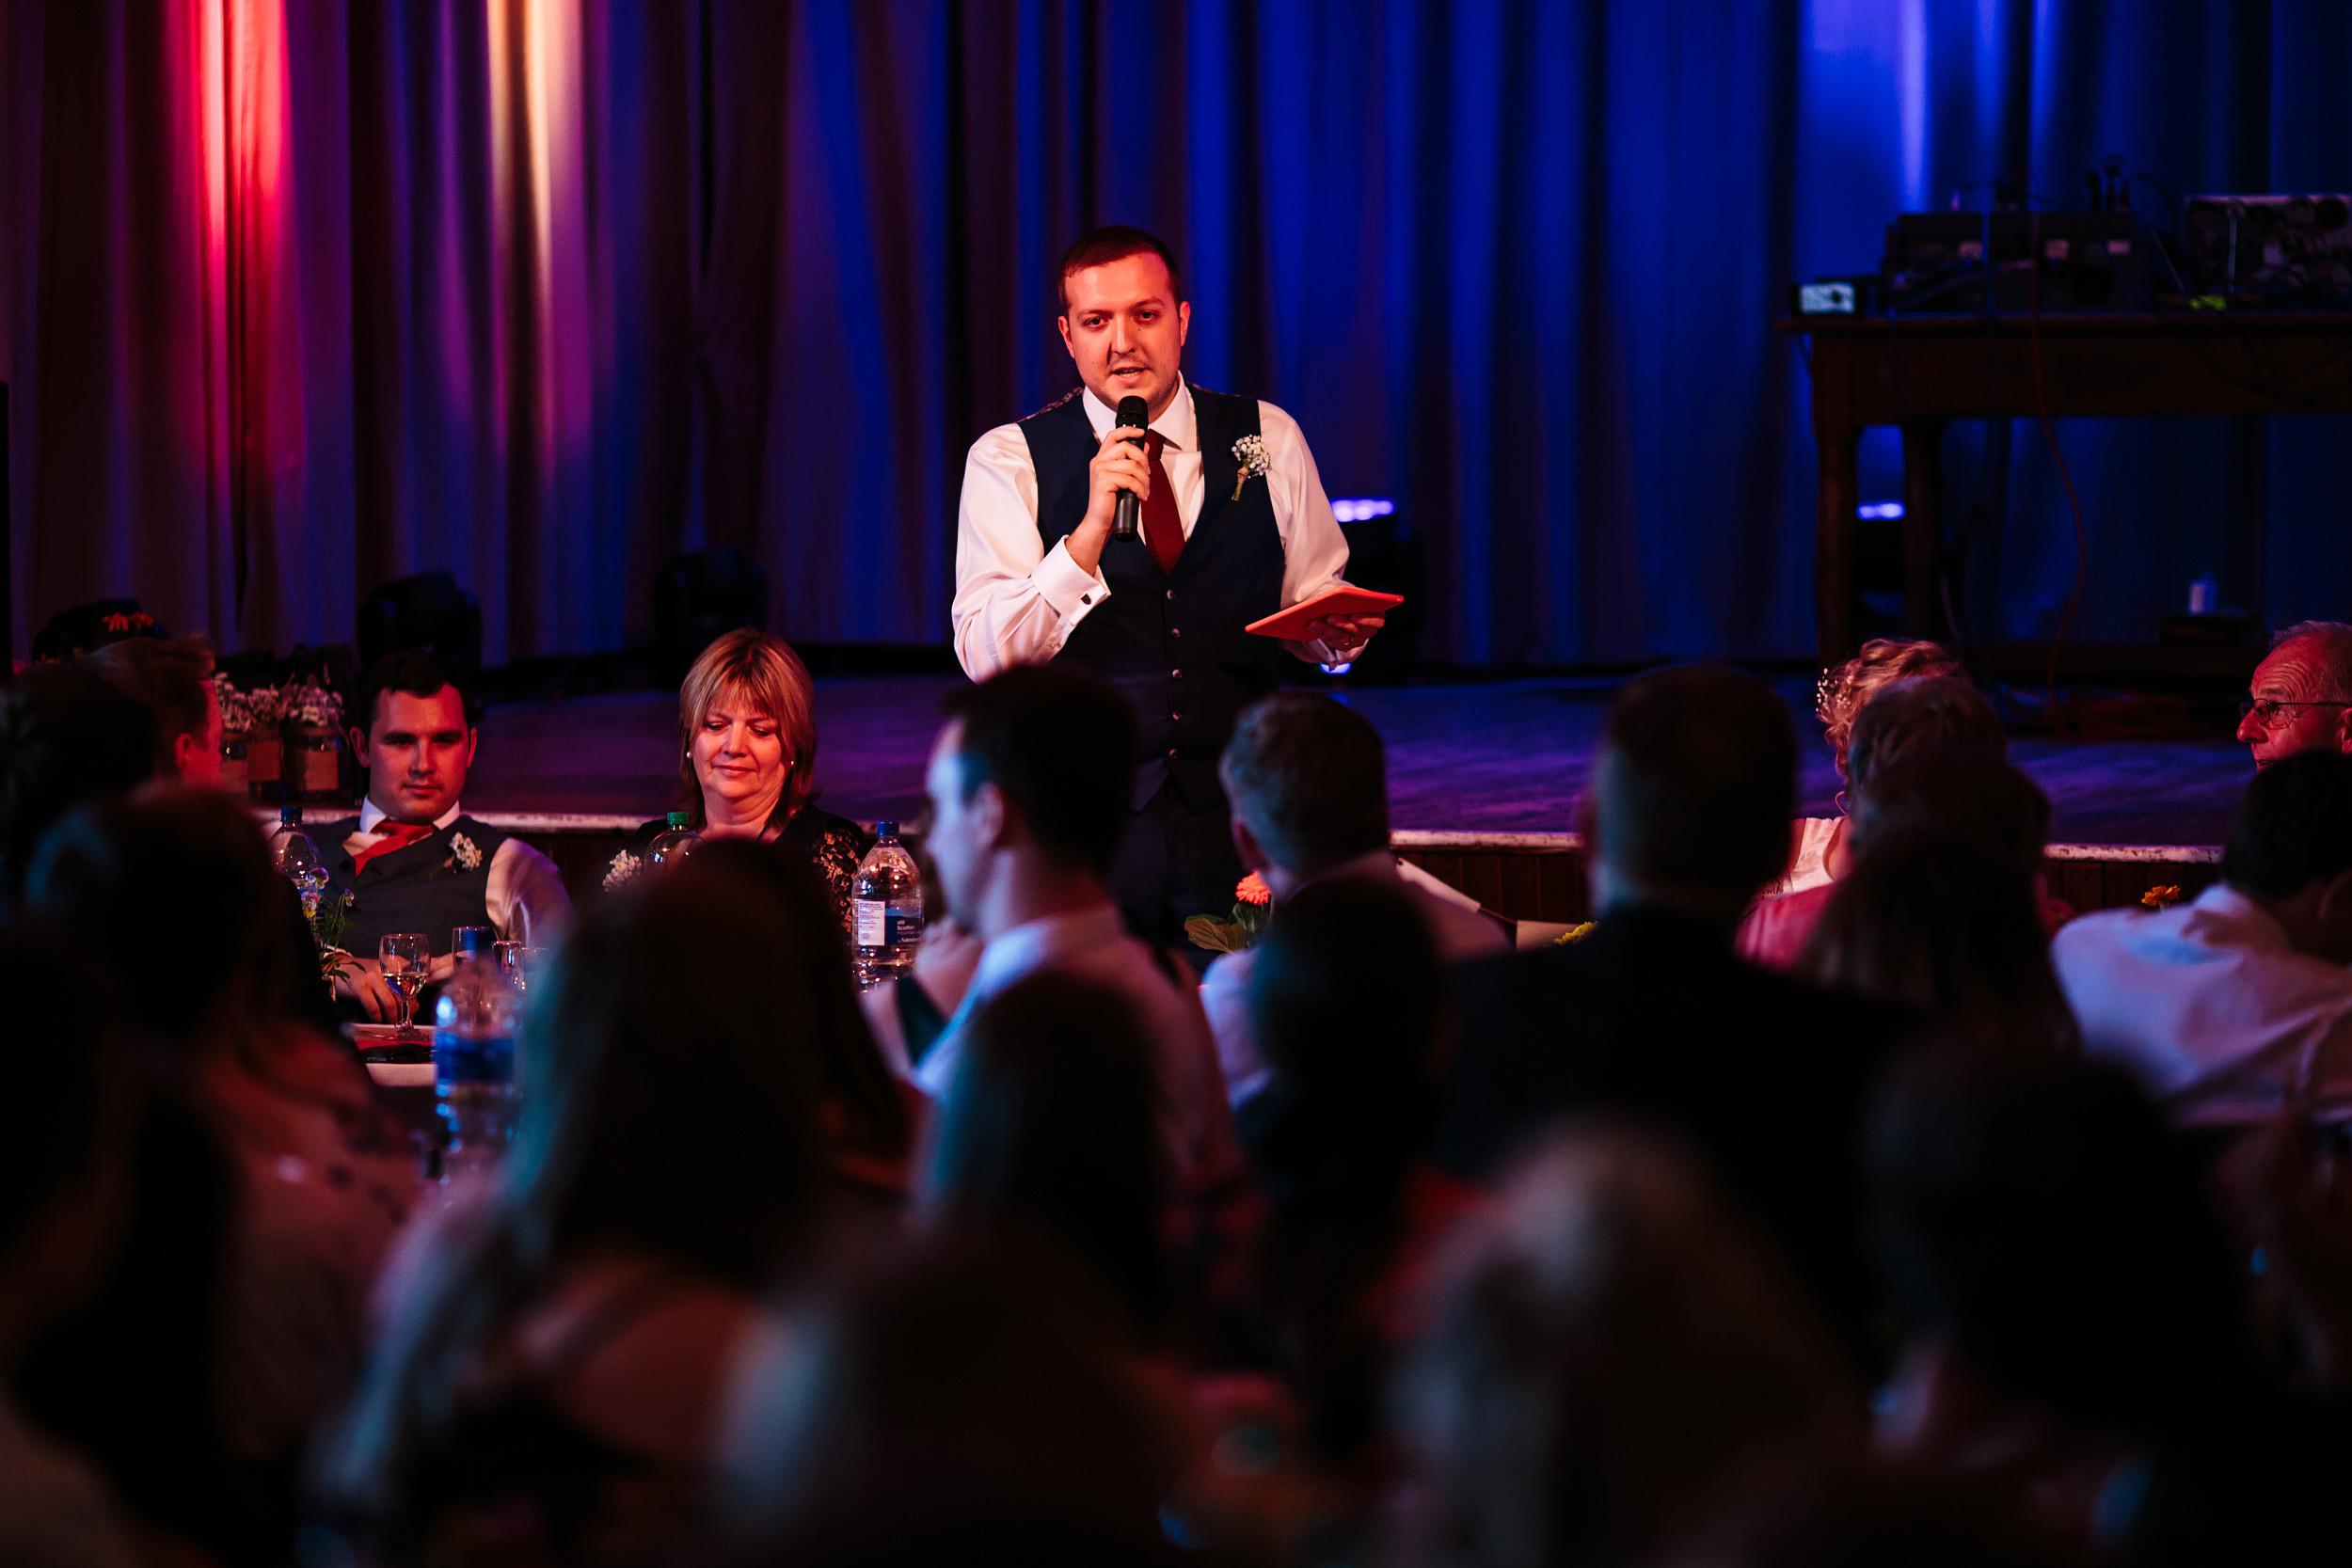 Grooms speech on his wedding day in Lancashire